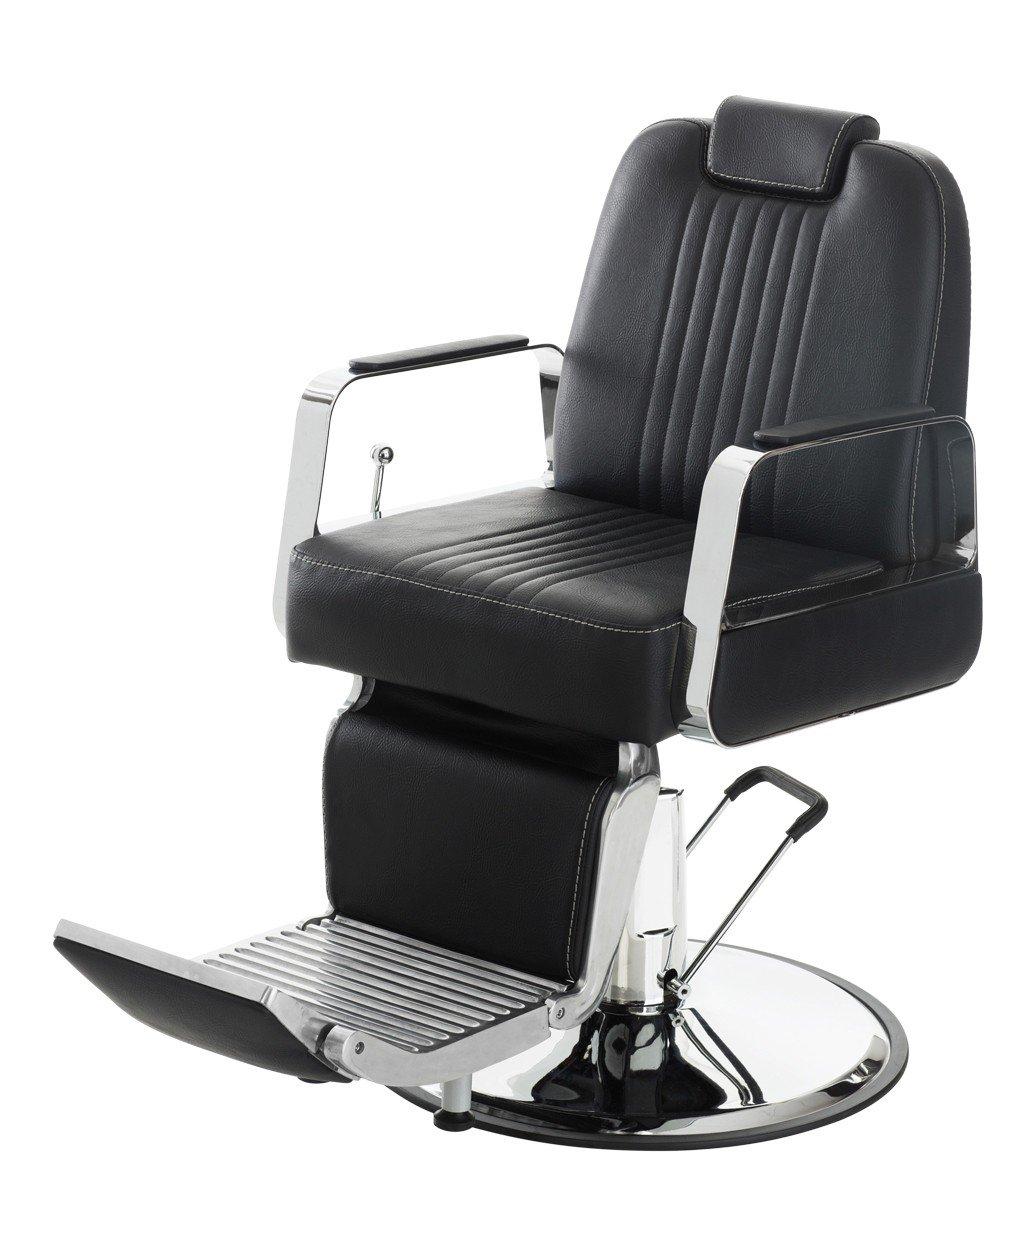 Amazon.com: BR Belleza Lenox profesional Silla de Barber: Beauty